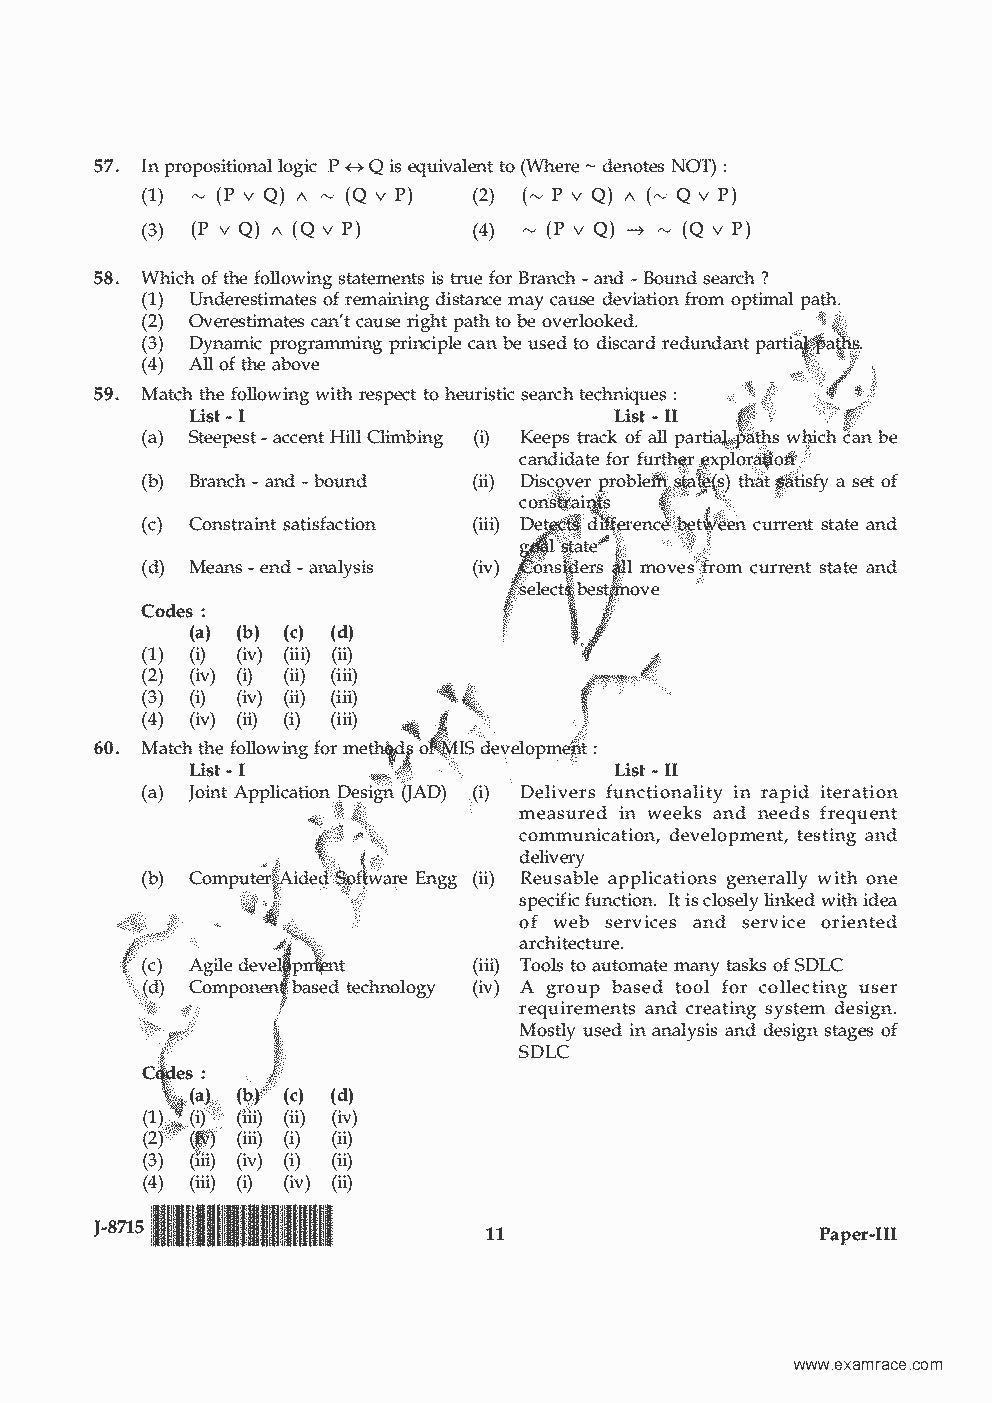 Net Exam Syllabus For Computer Science 2014 Pdf